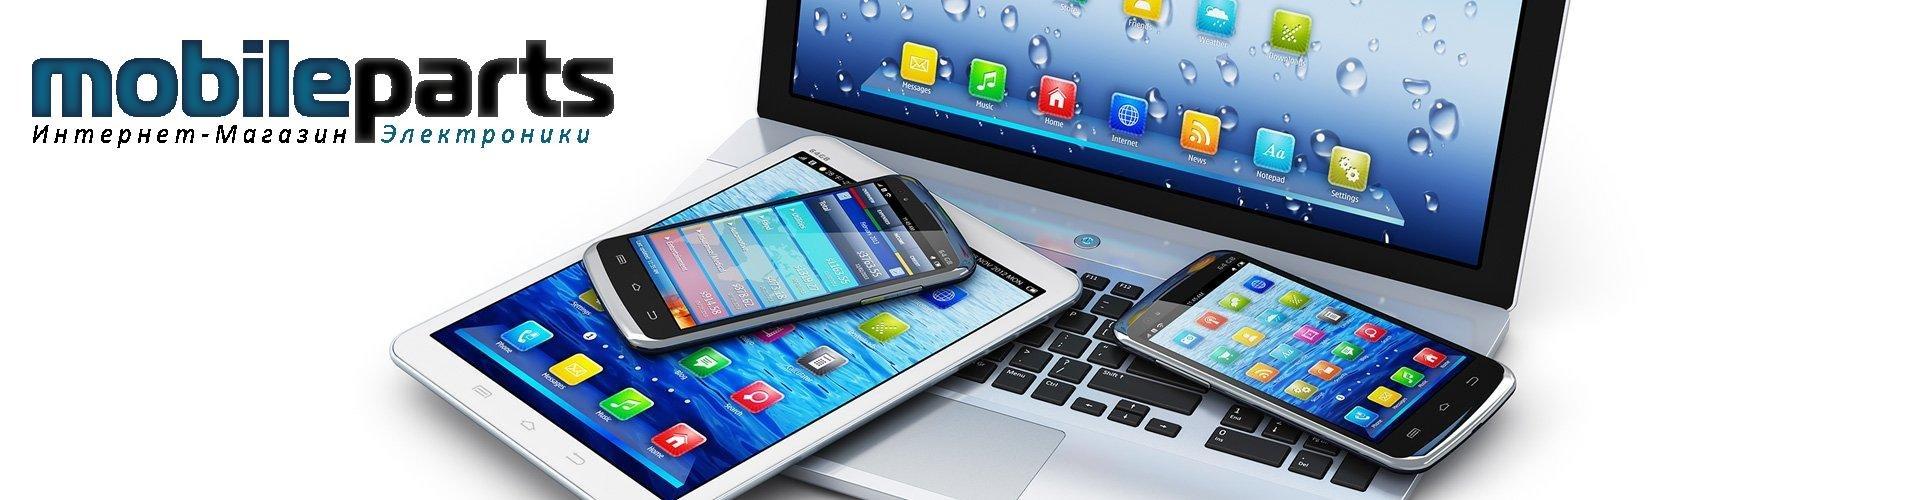 Mobileparts, Internet magazin